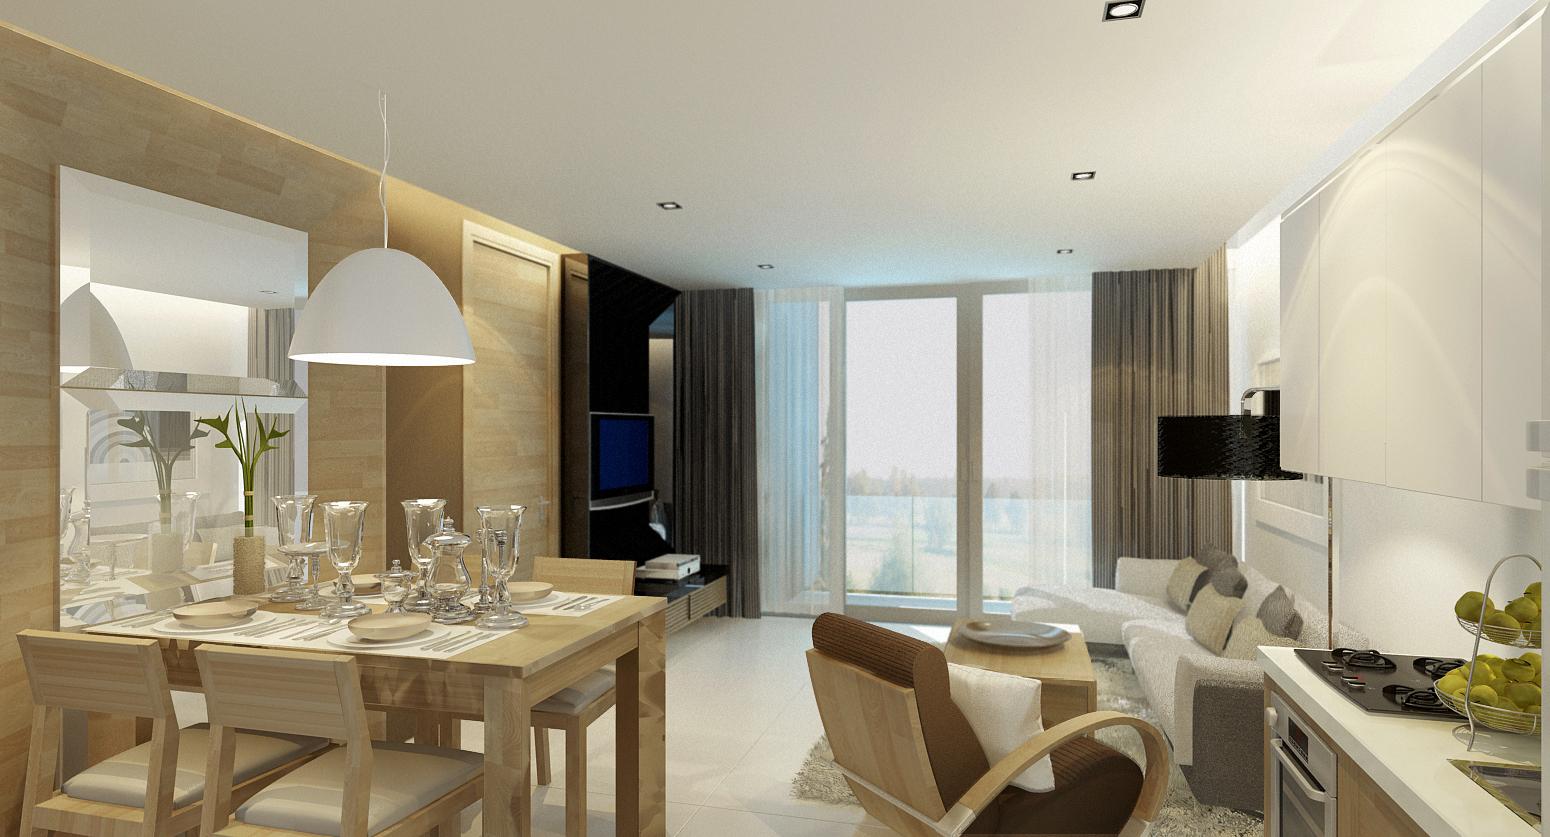 Living room type B